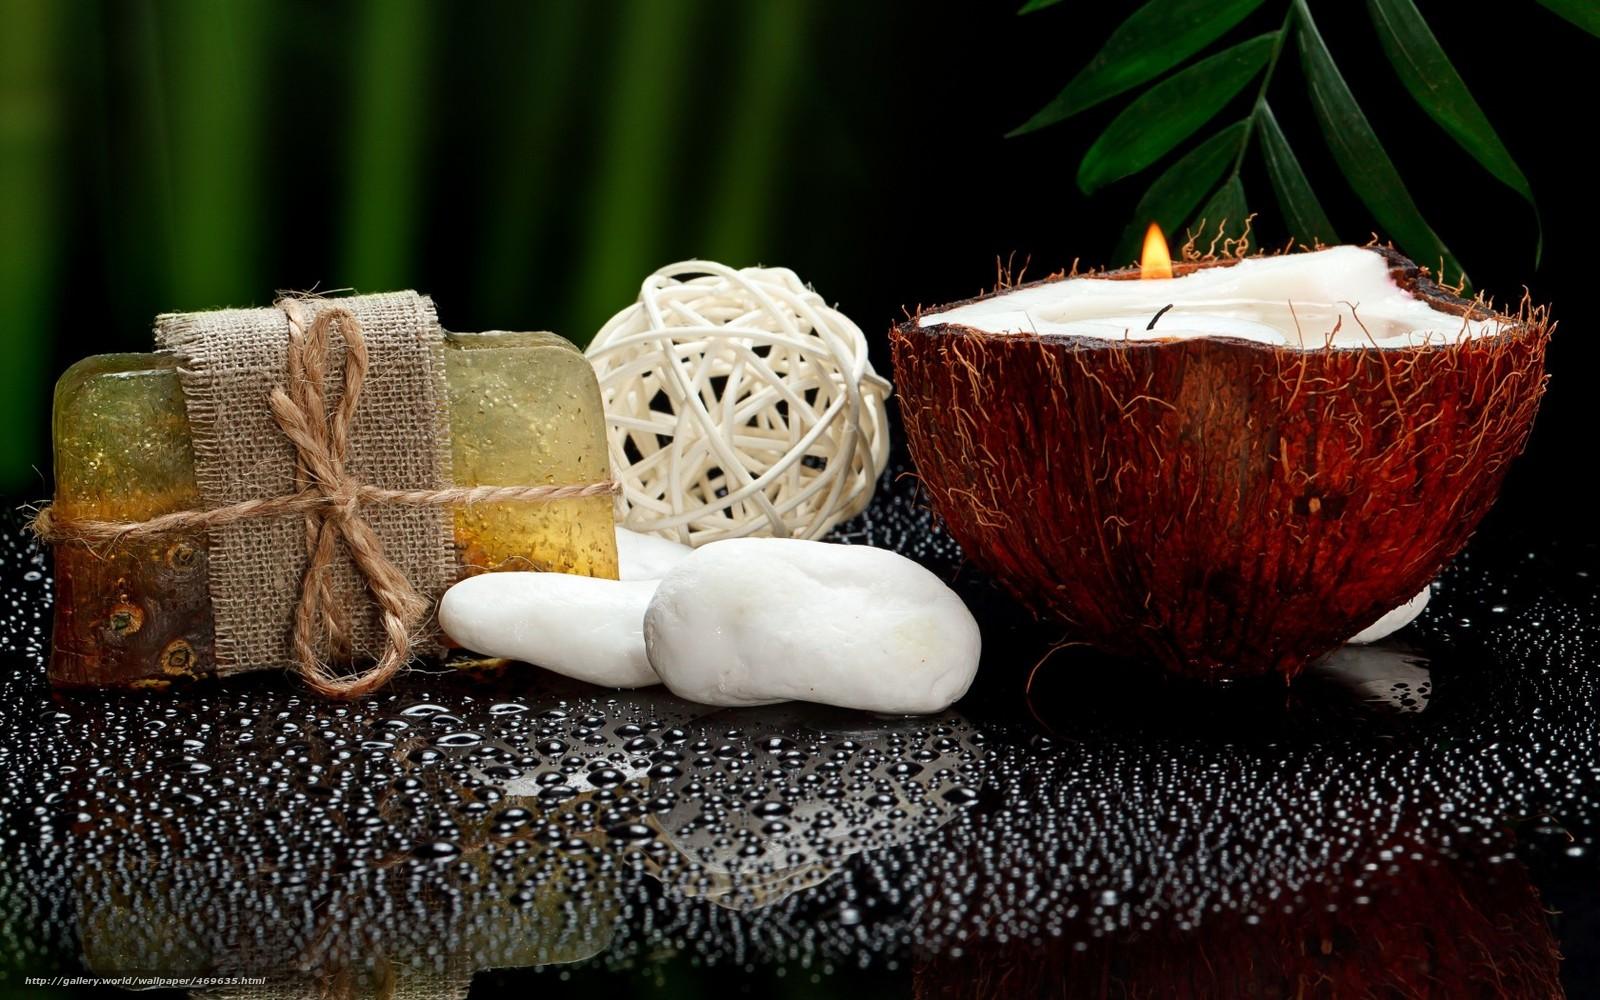 Download wallpaper spa soap candle coconut free desktop for Salon wallpaper